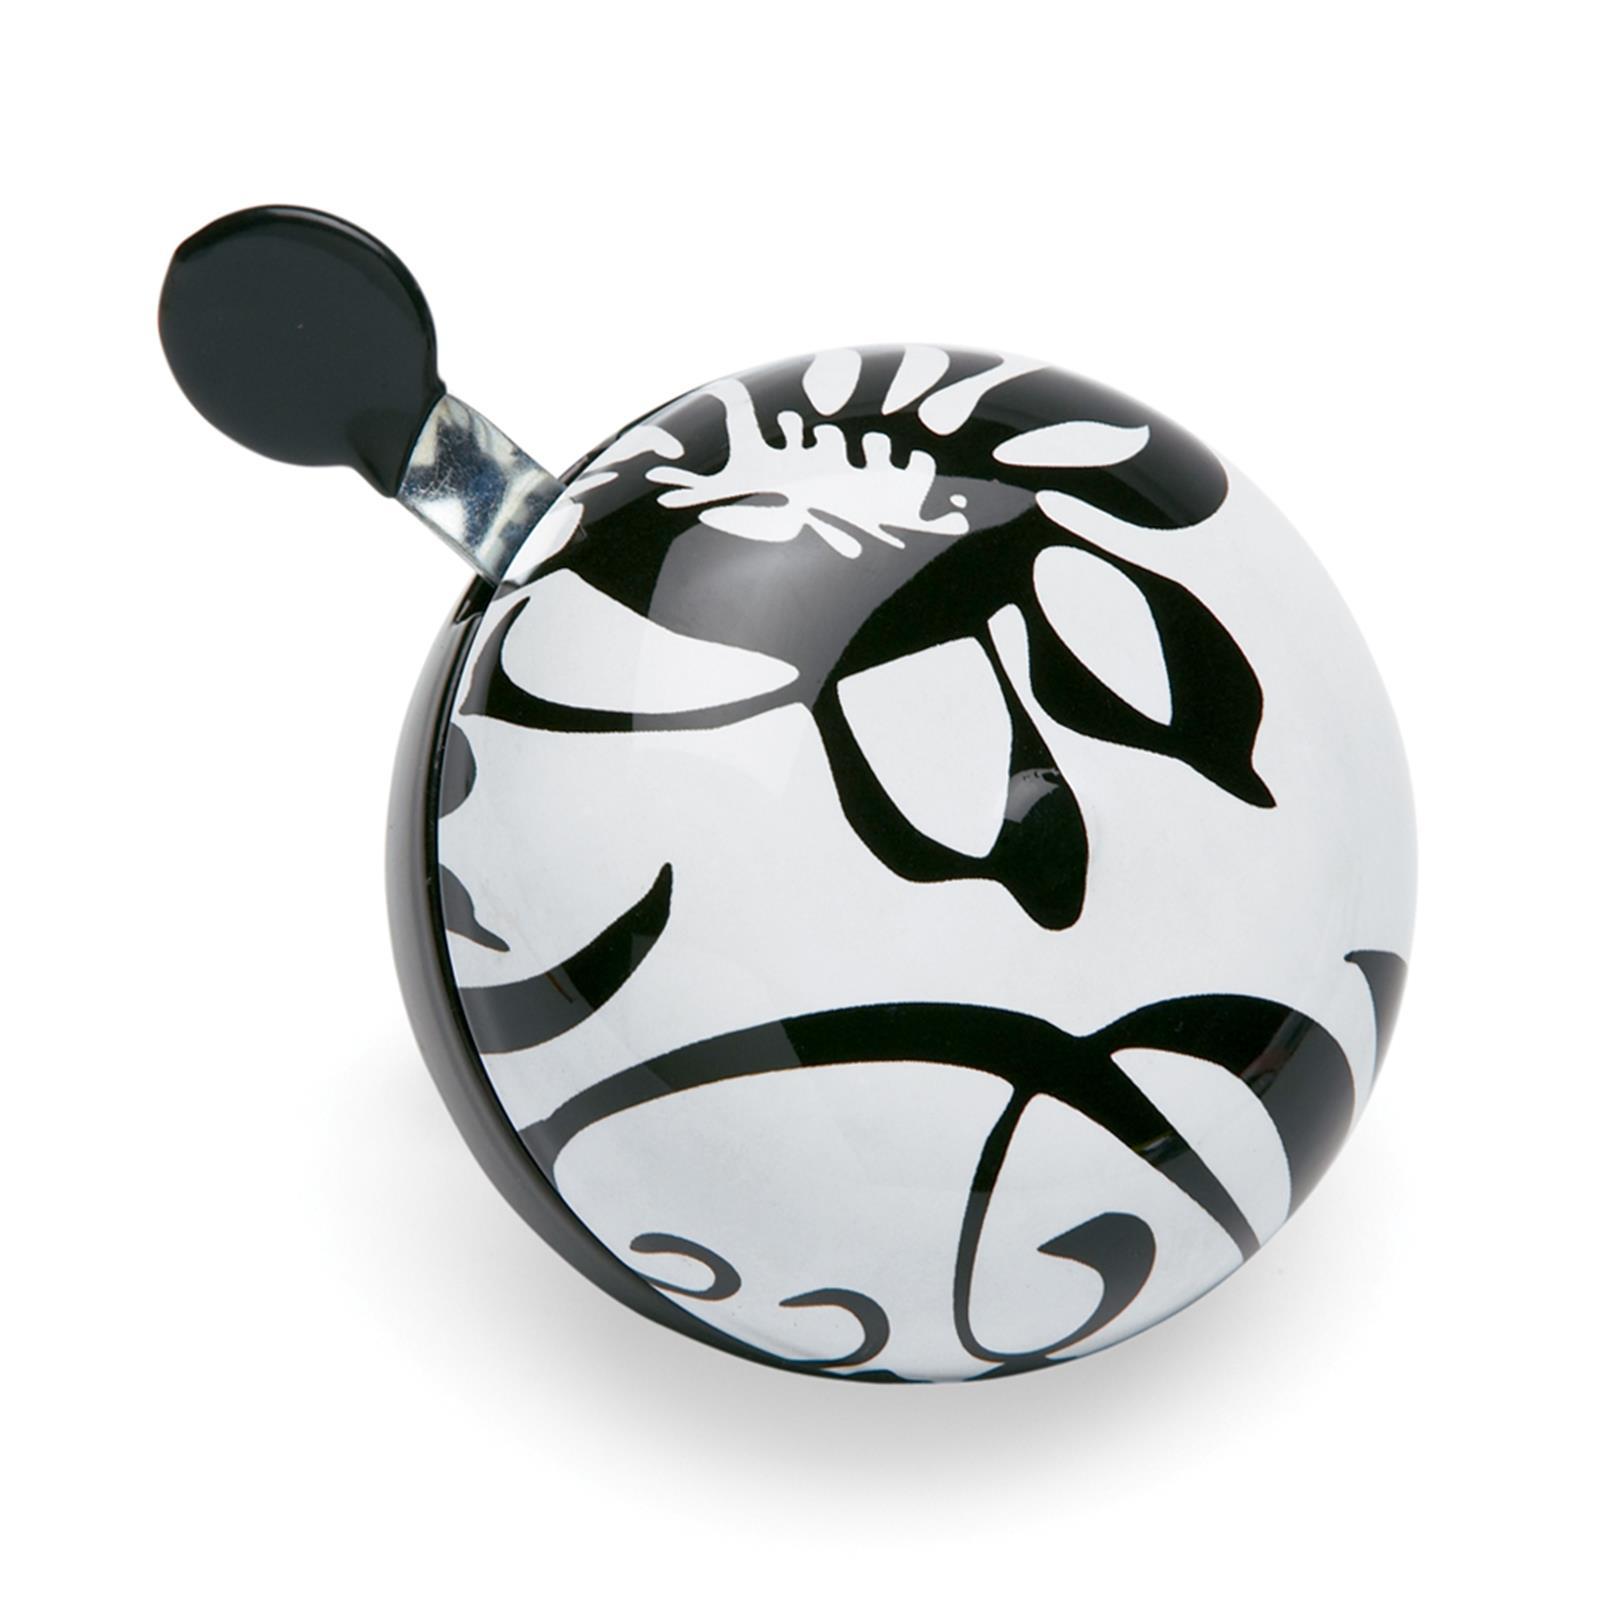 wow electra ding dong fahrrad klingel glocke extra laut gro xxl 80mm designer ebay. Black Bedroom Furniture Sets. Home Design Ideas